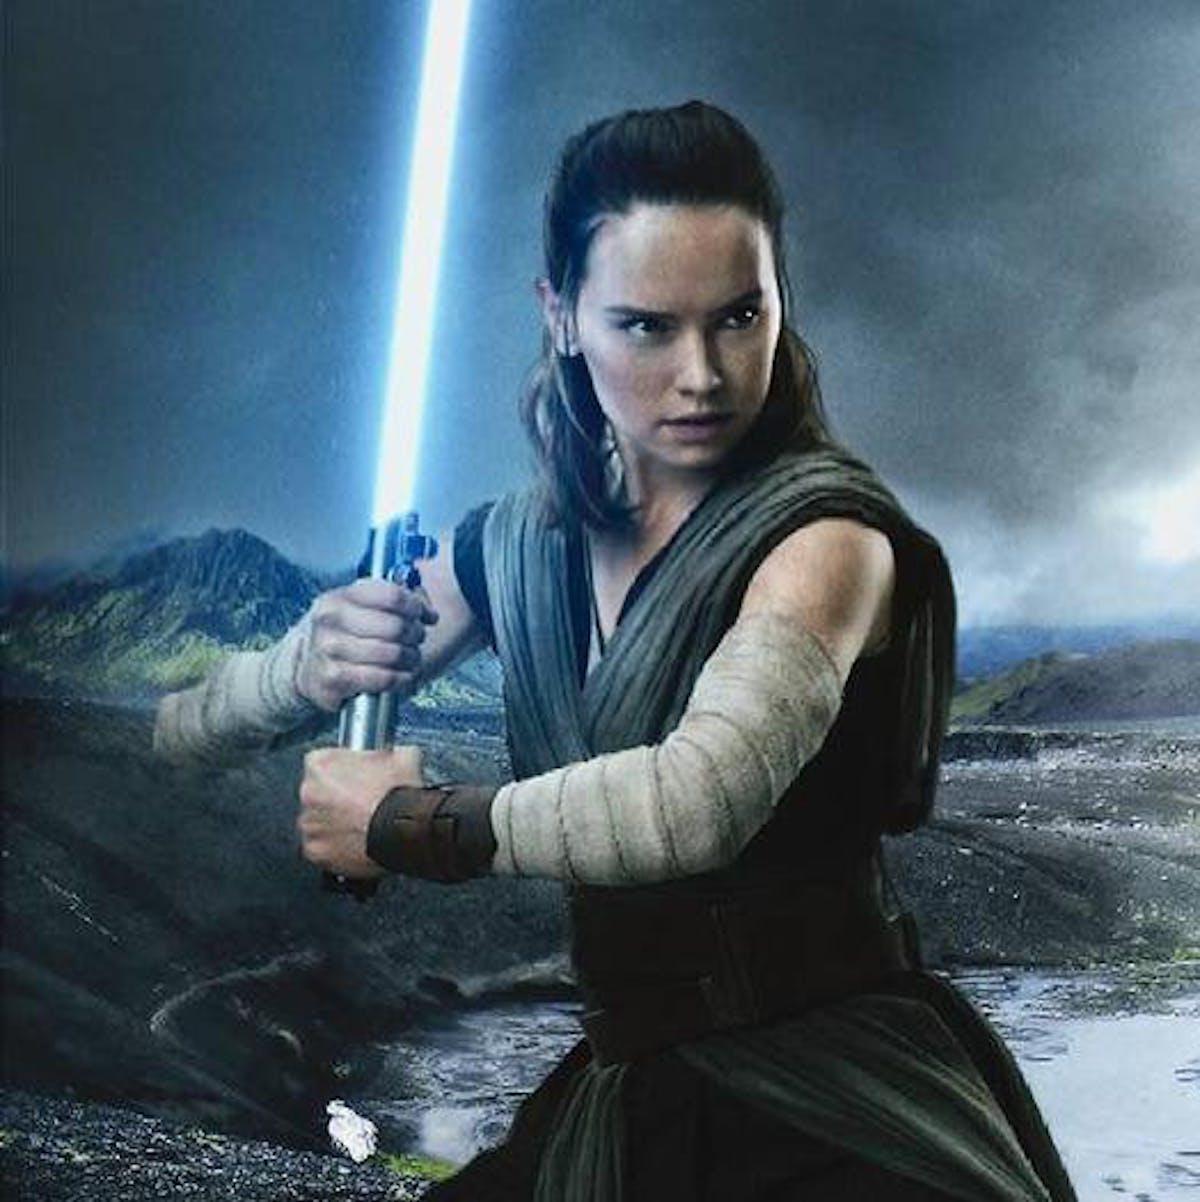 'Star Wars 9' spoilers: New comic may solve mystery of Luke's lightsaber